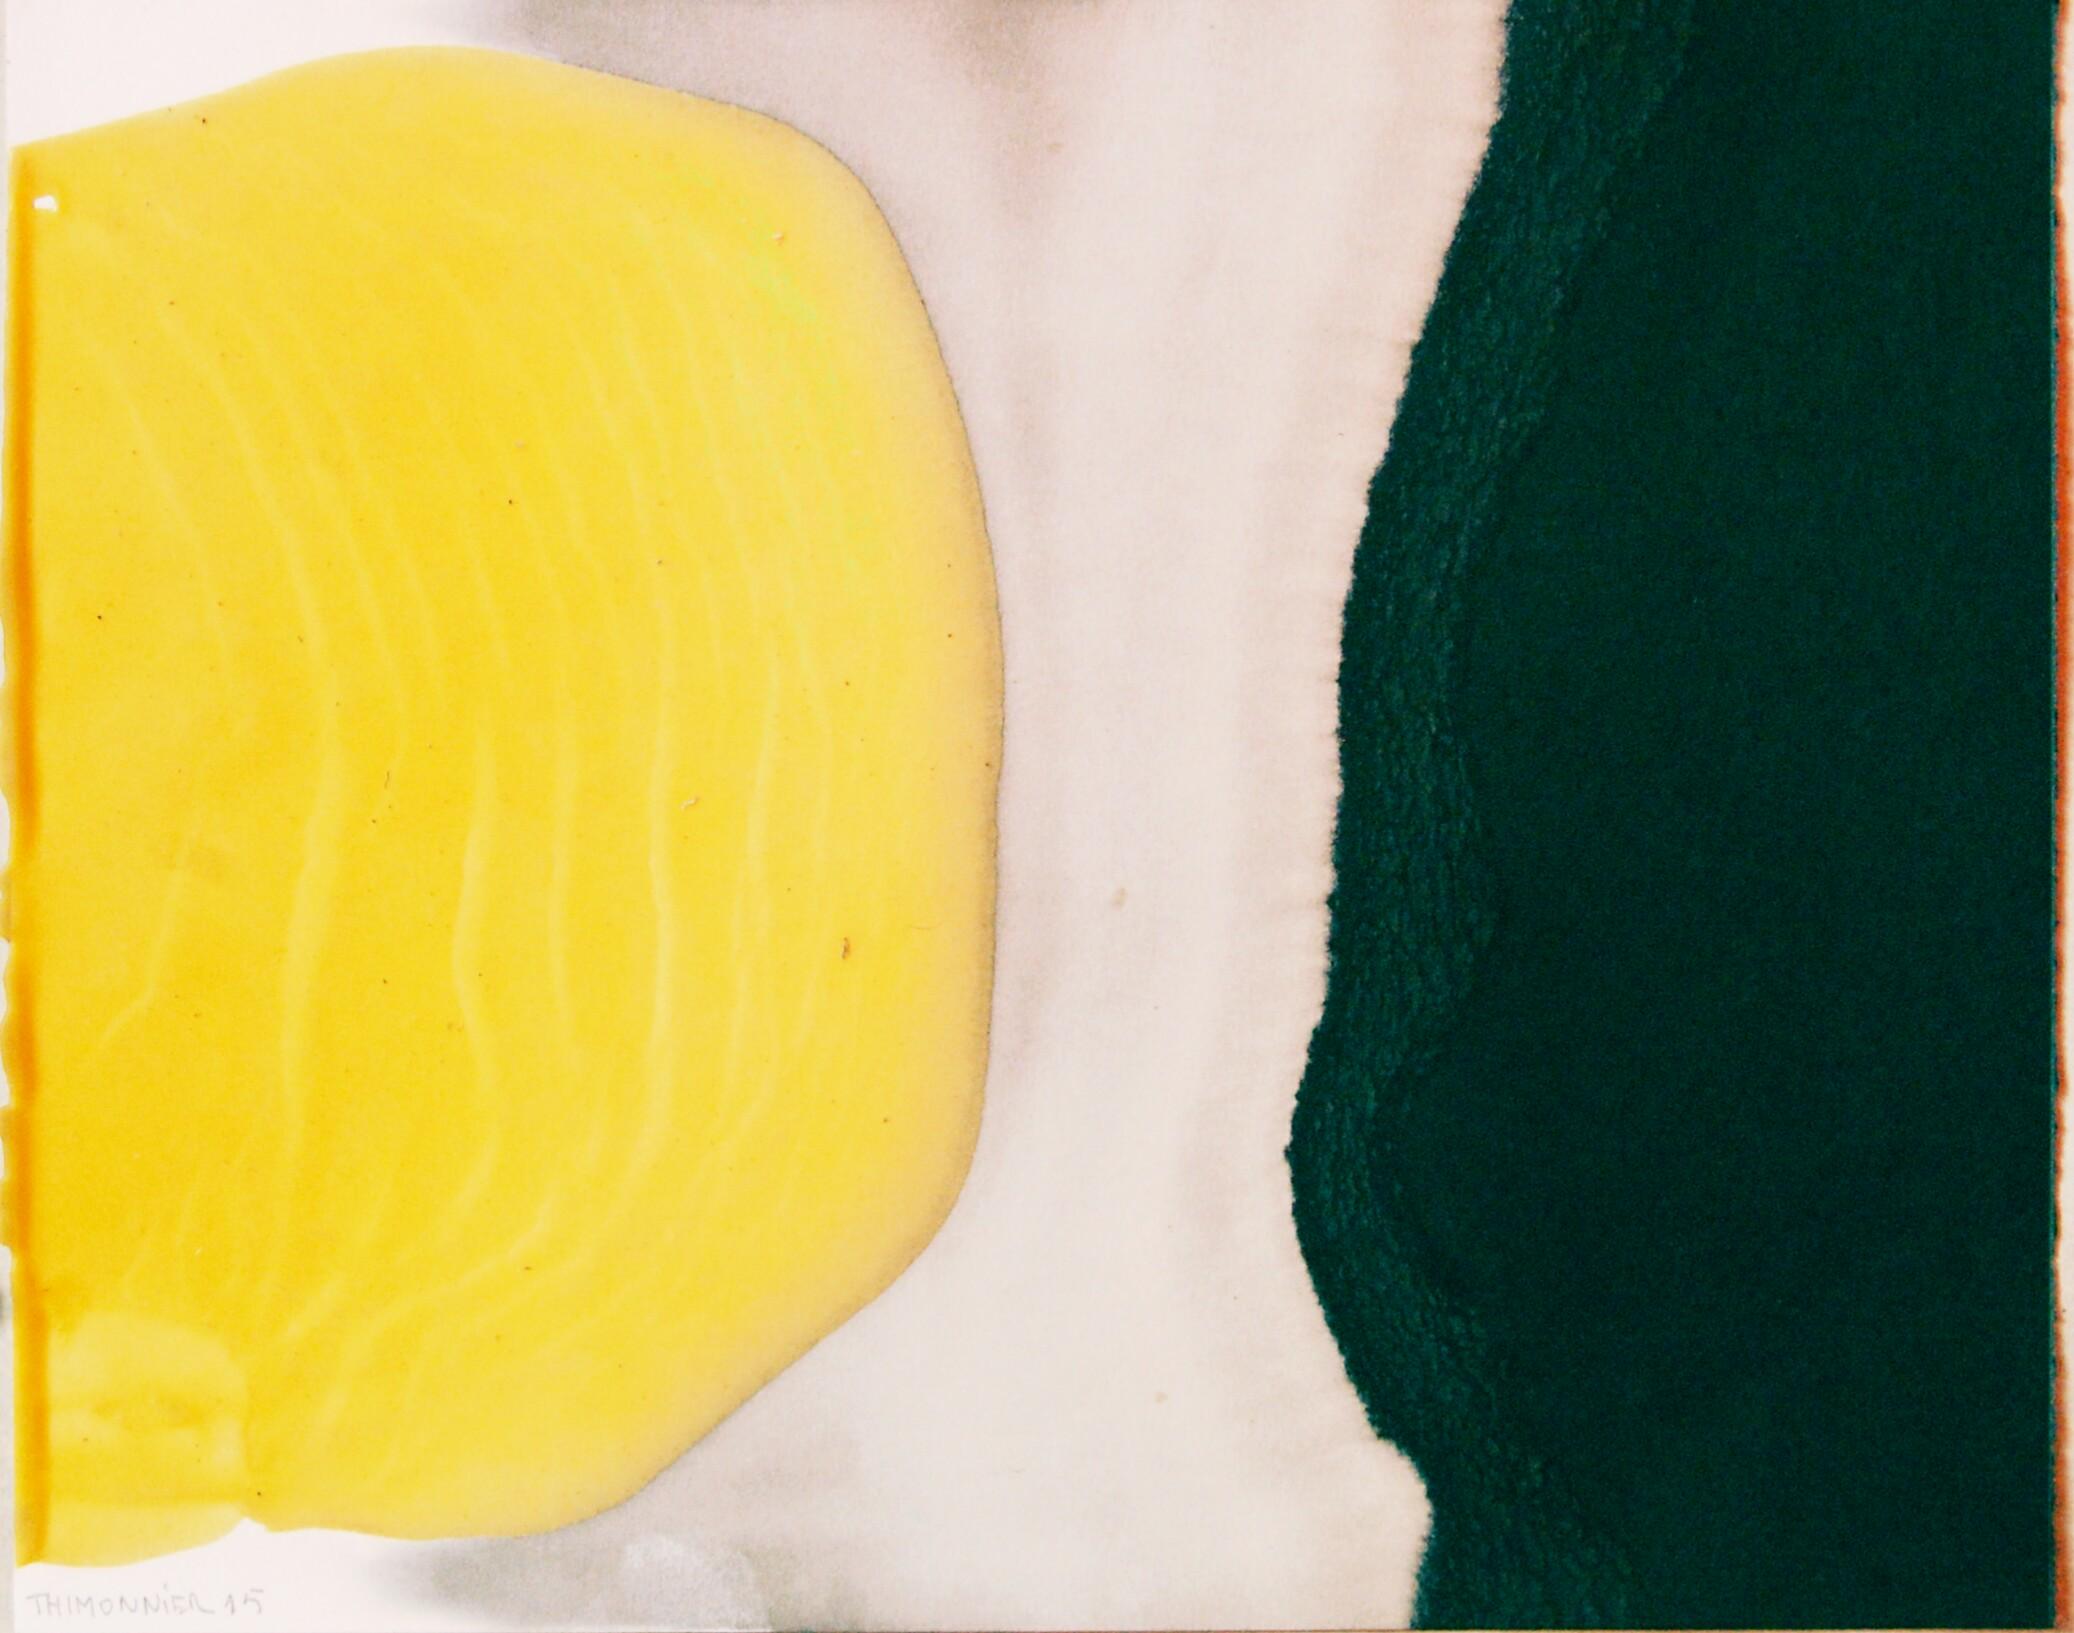 Cire et huile 30x40 2013